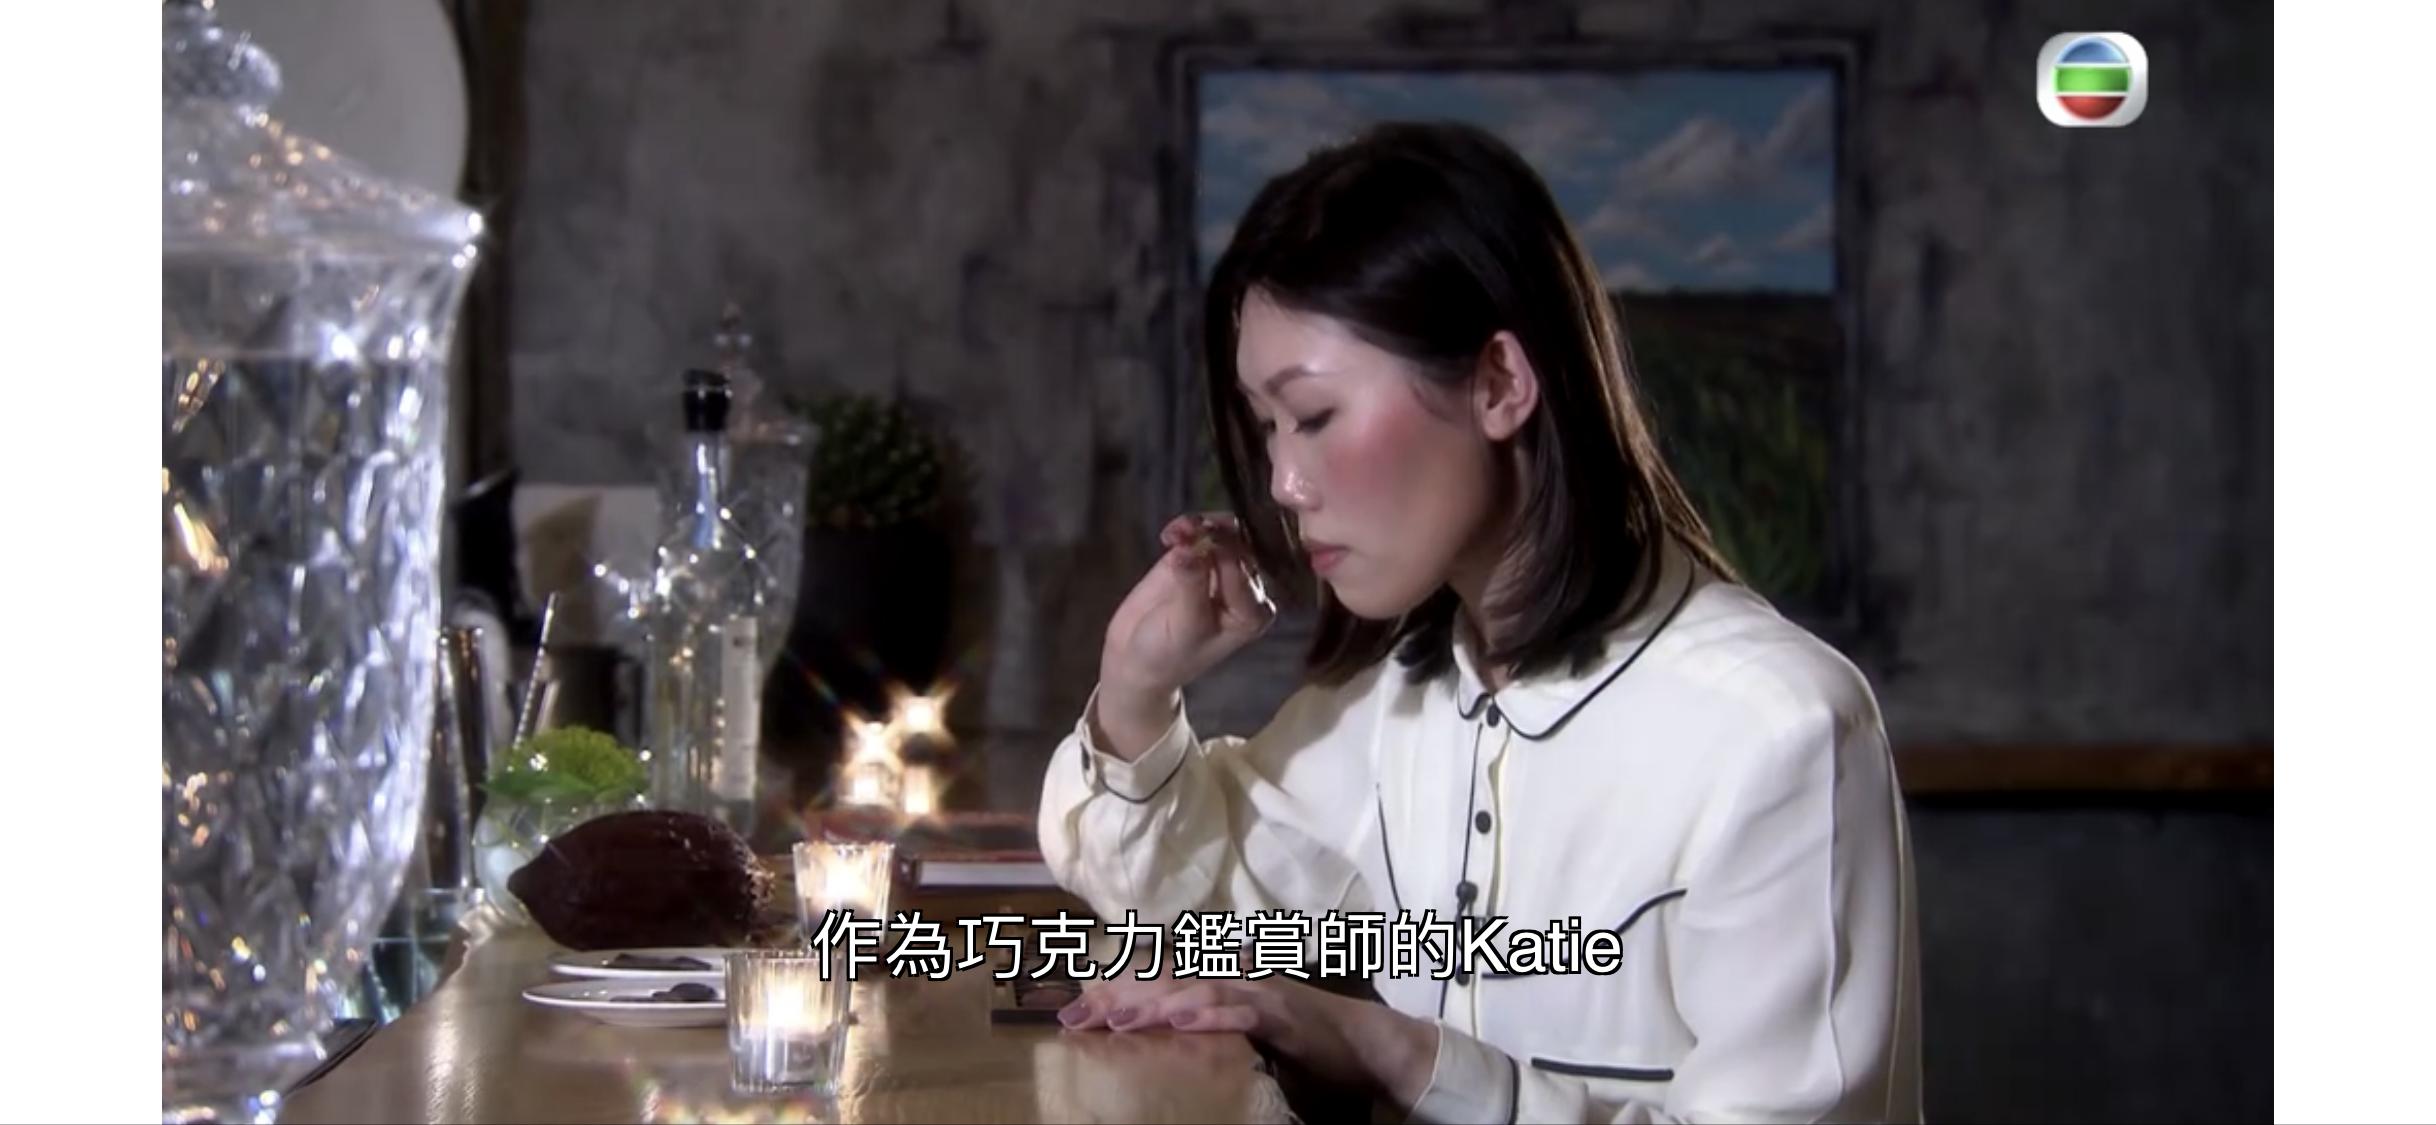 TVB news channel